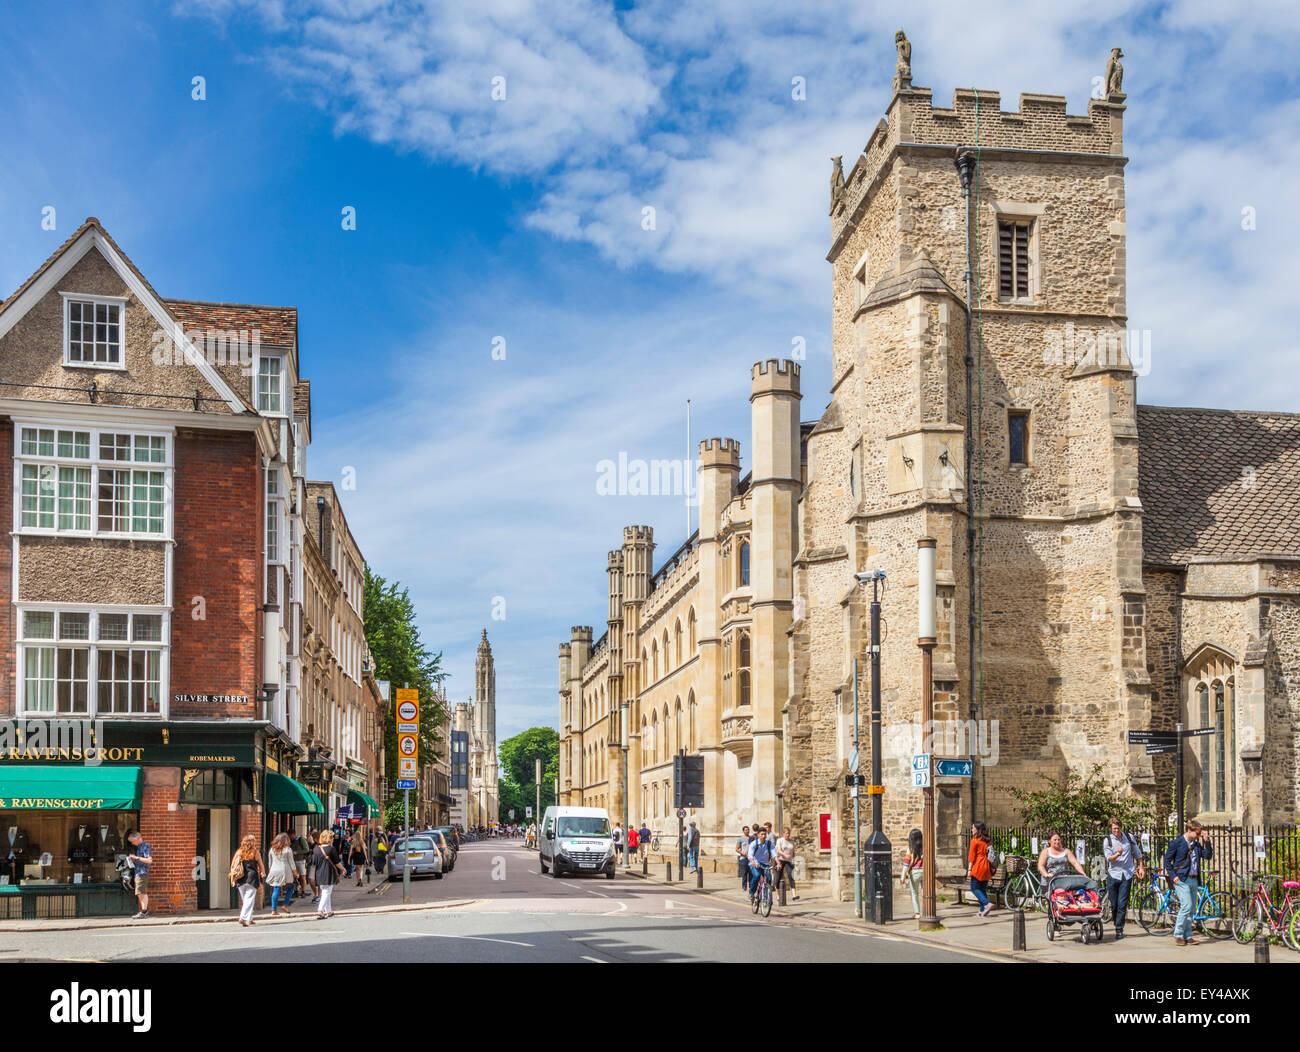 Corpus Christi College at Silver Street Cambridge Cambridgeshire England UK GB EU Europe - Stock Image